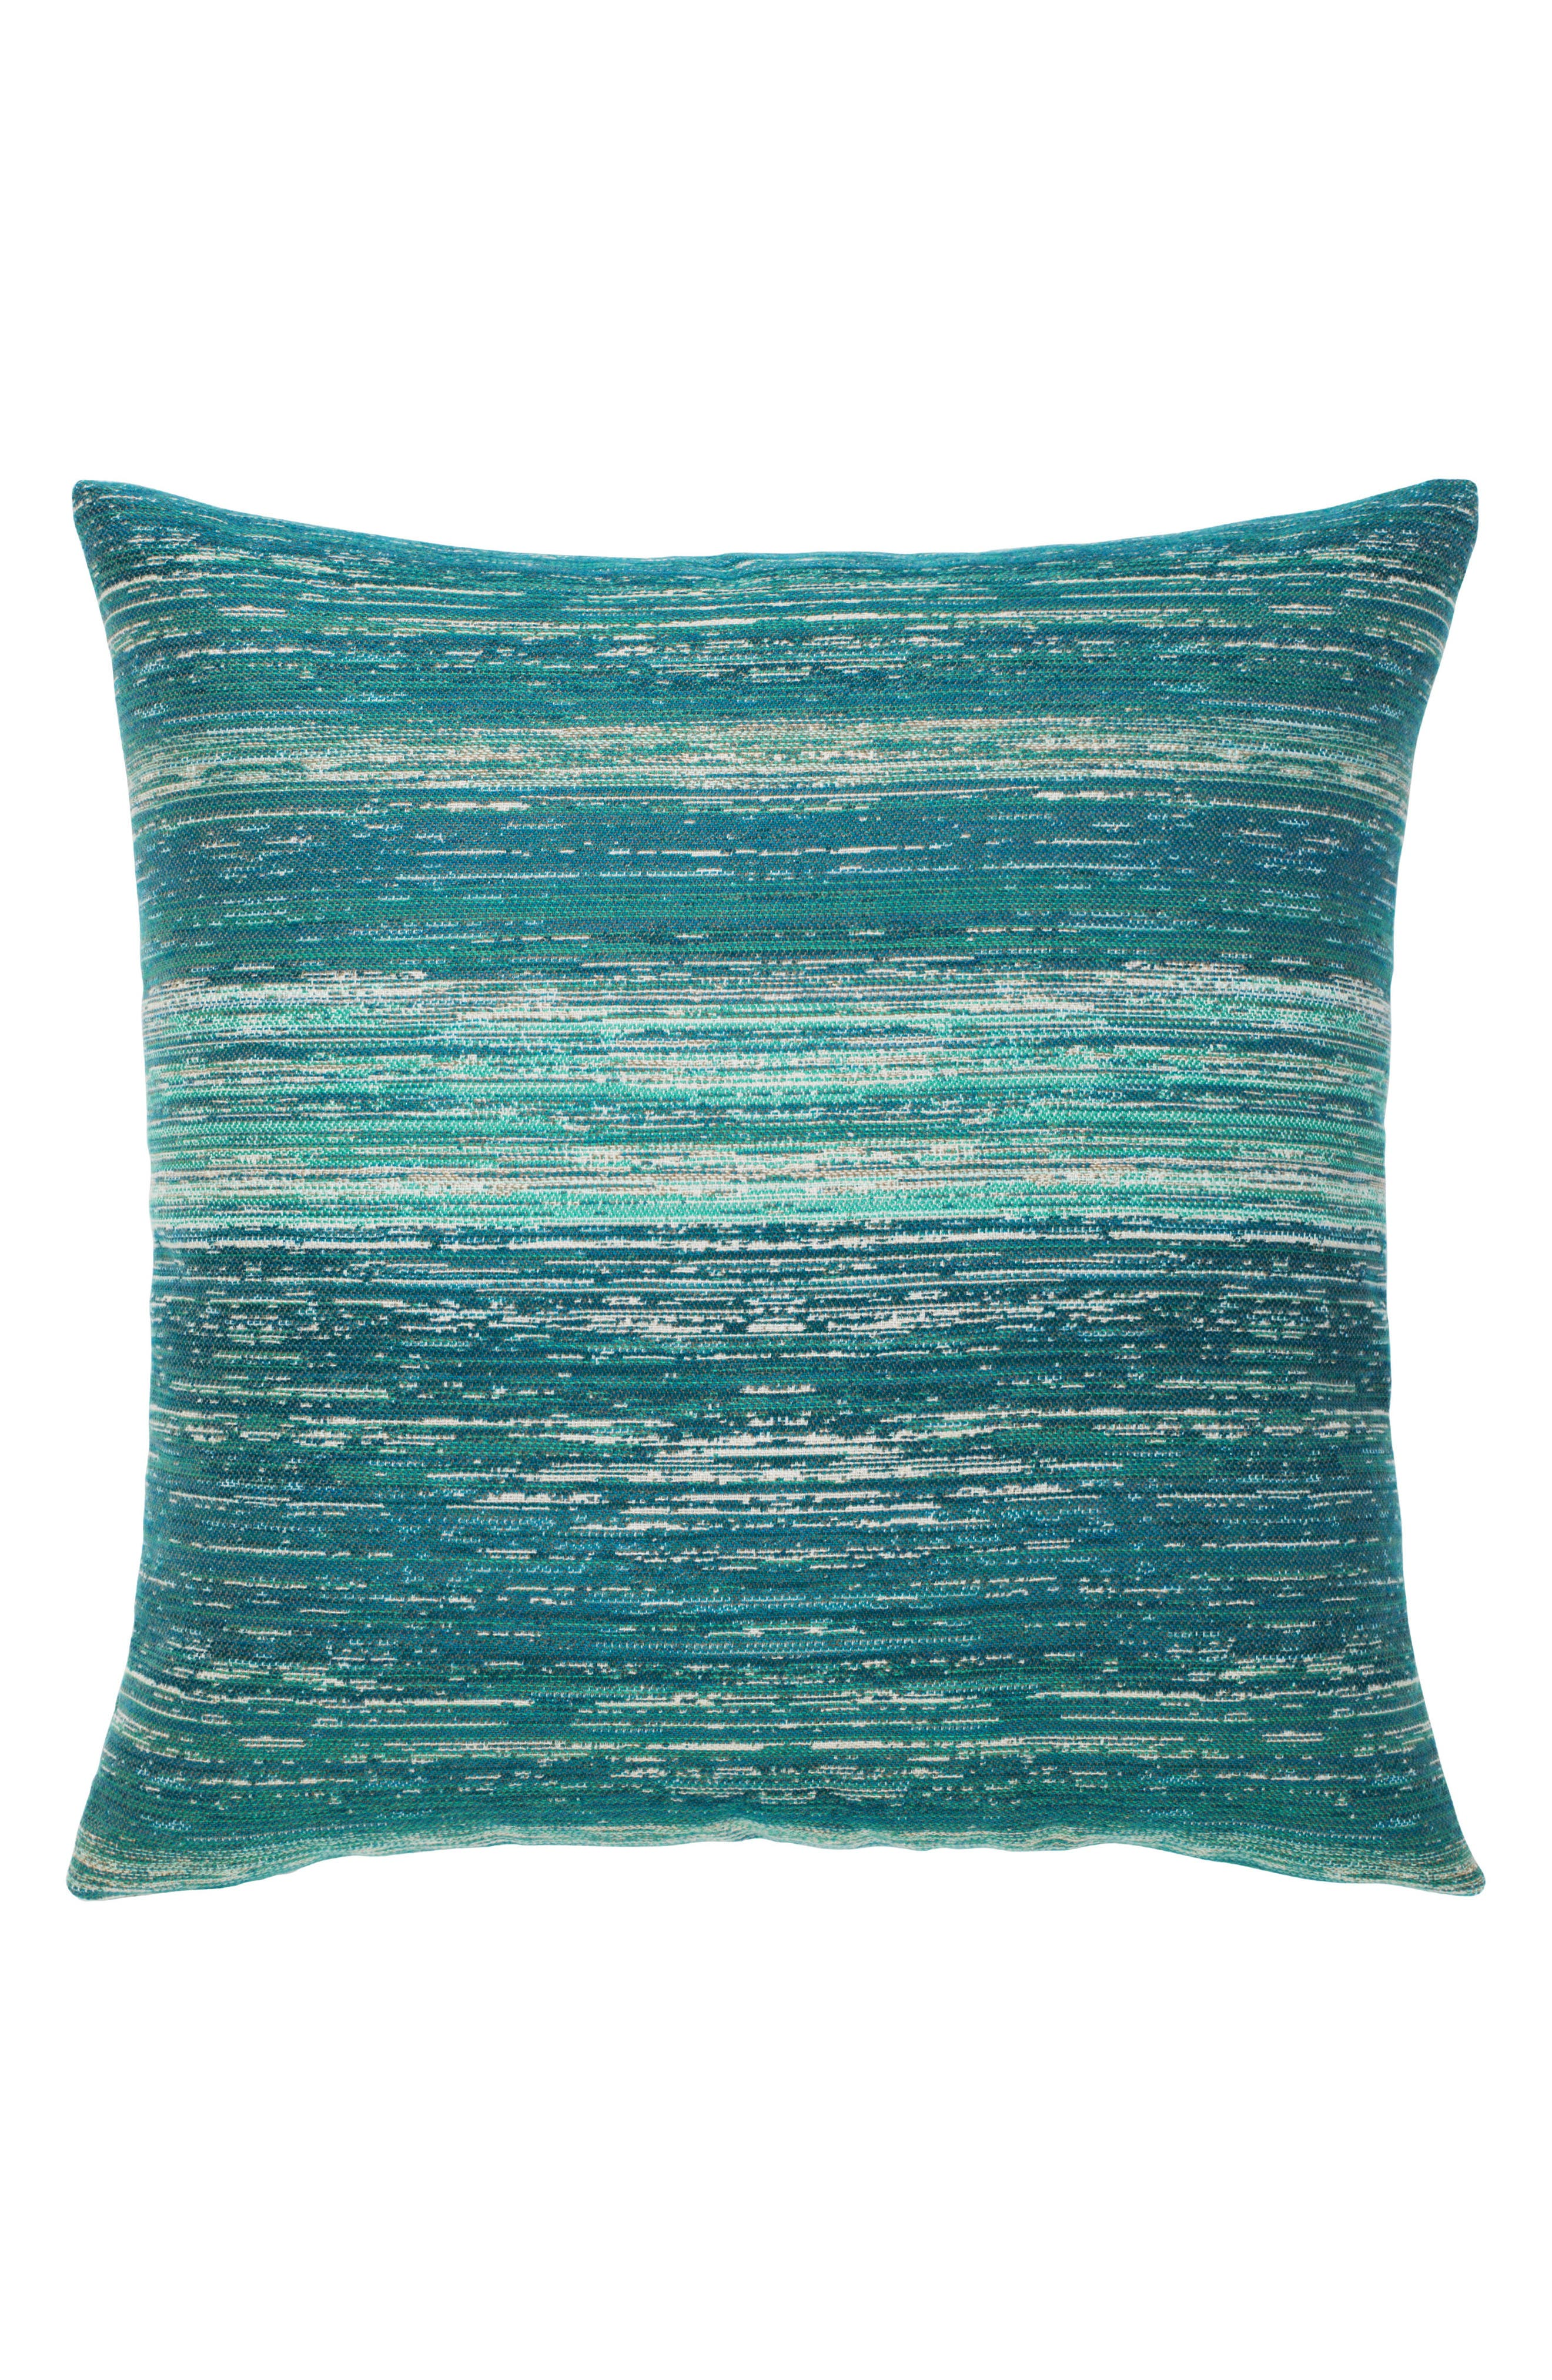 Texture Lagoon Accent Pillow,                         Main,                         color, BLUE